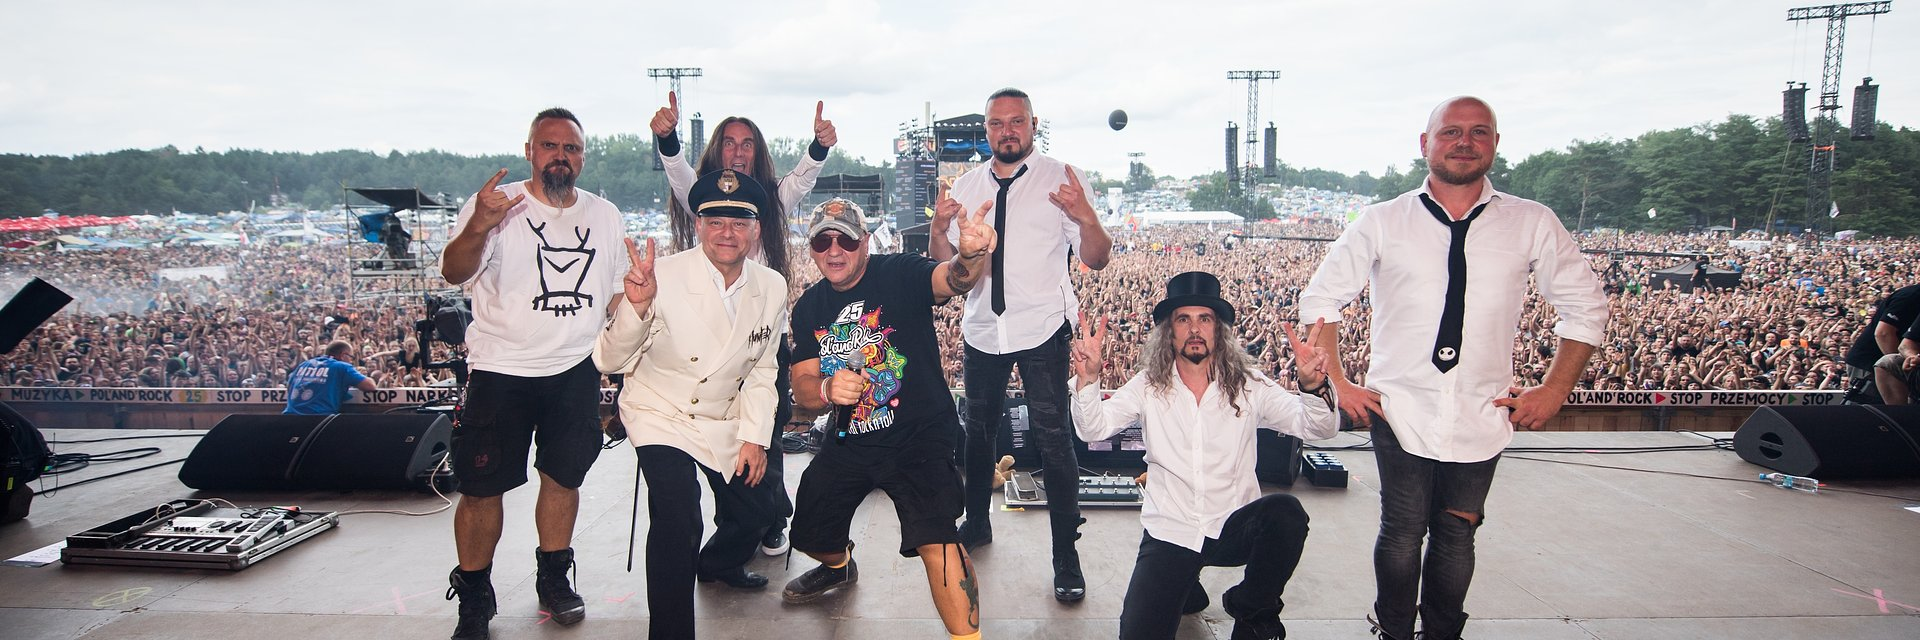 Pierwsi reprezentanci soul metalu w Polsce na Pol'and'Rock Festival Online